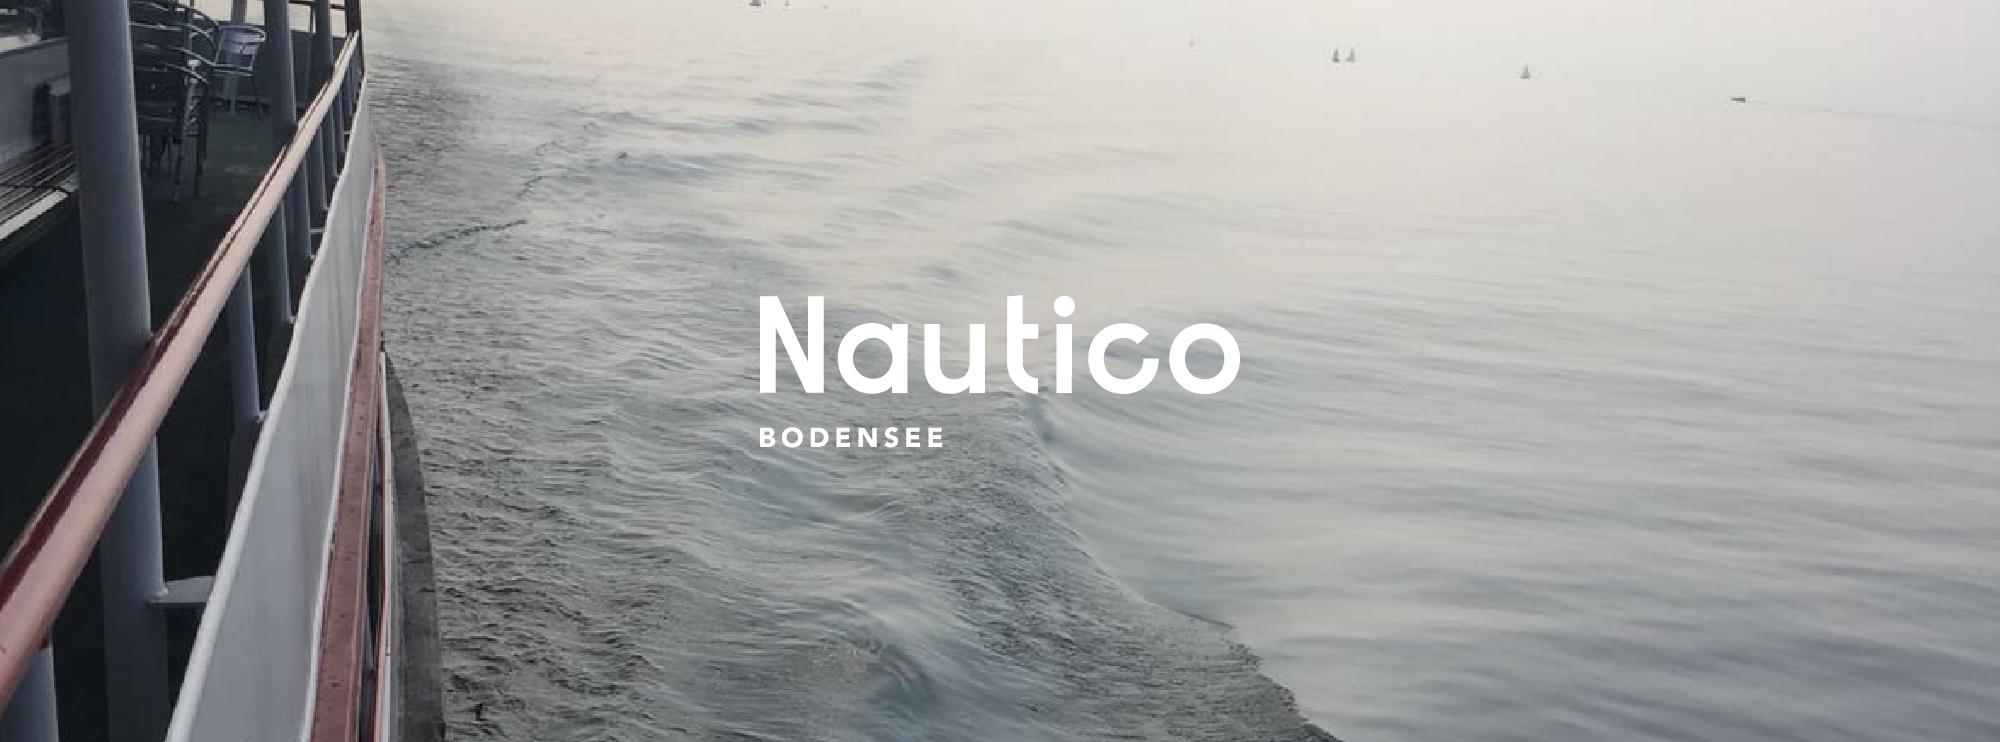 und co nautico header lake of canstance